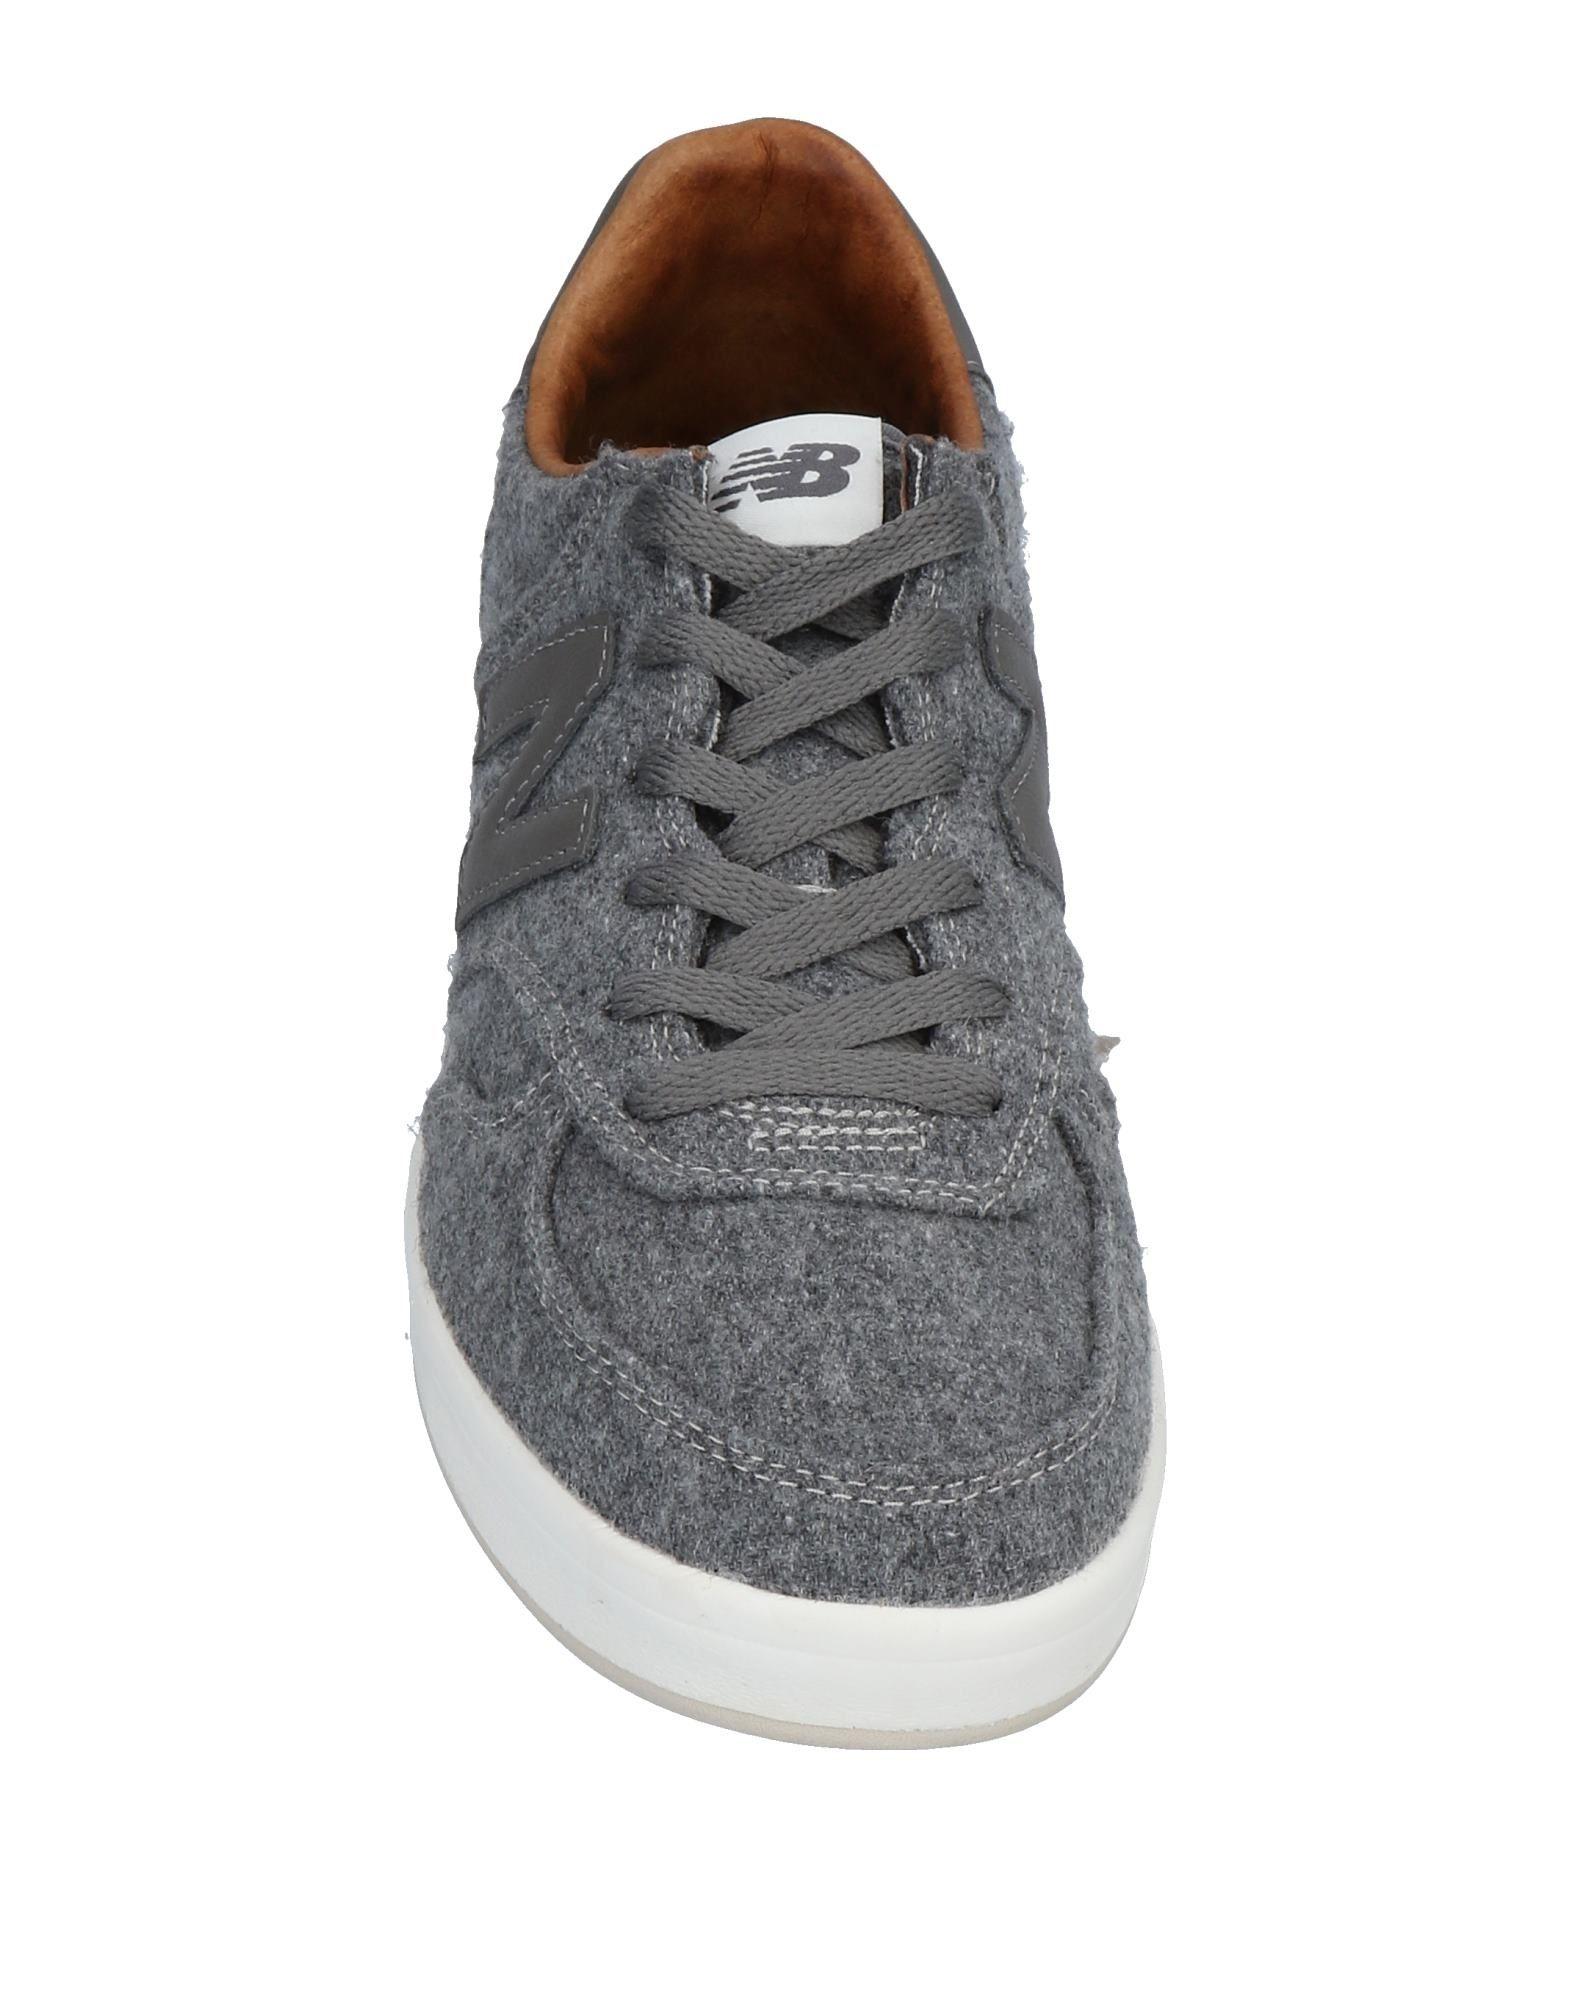 Rabatt echte Schuhe New Balance Sneakers Herren  11496893BV 11496893BV 11496893BV 3ff80b